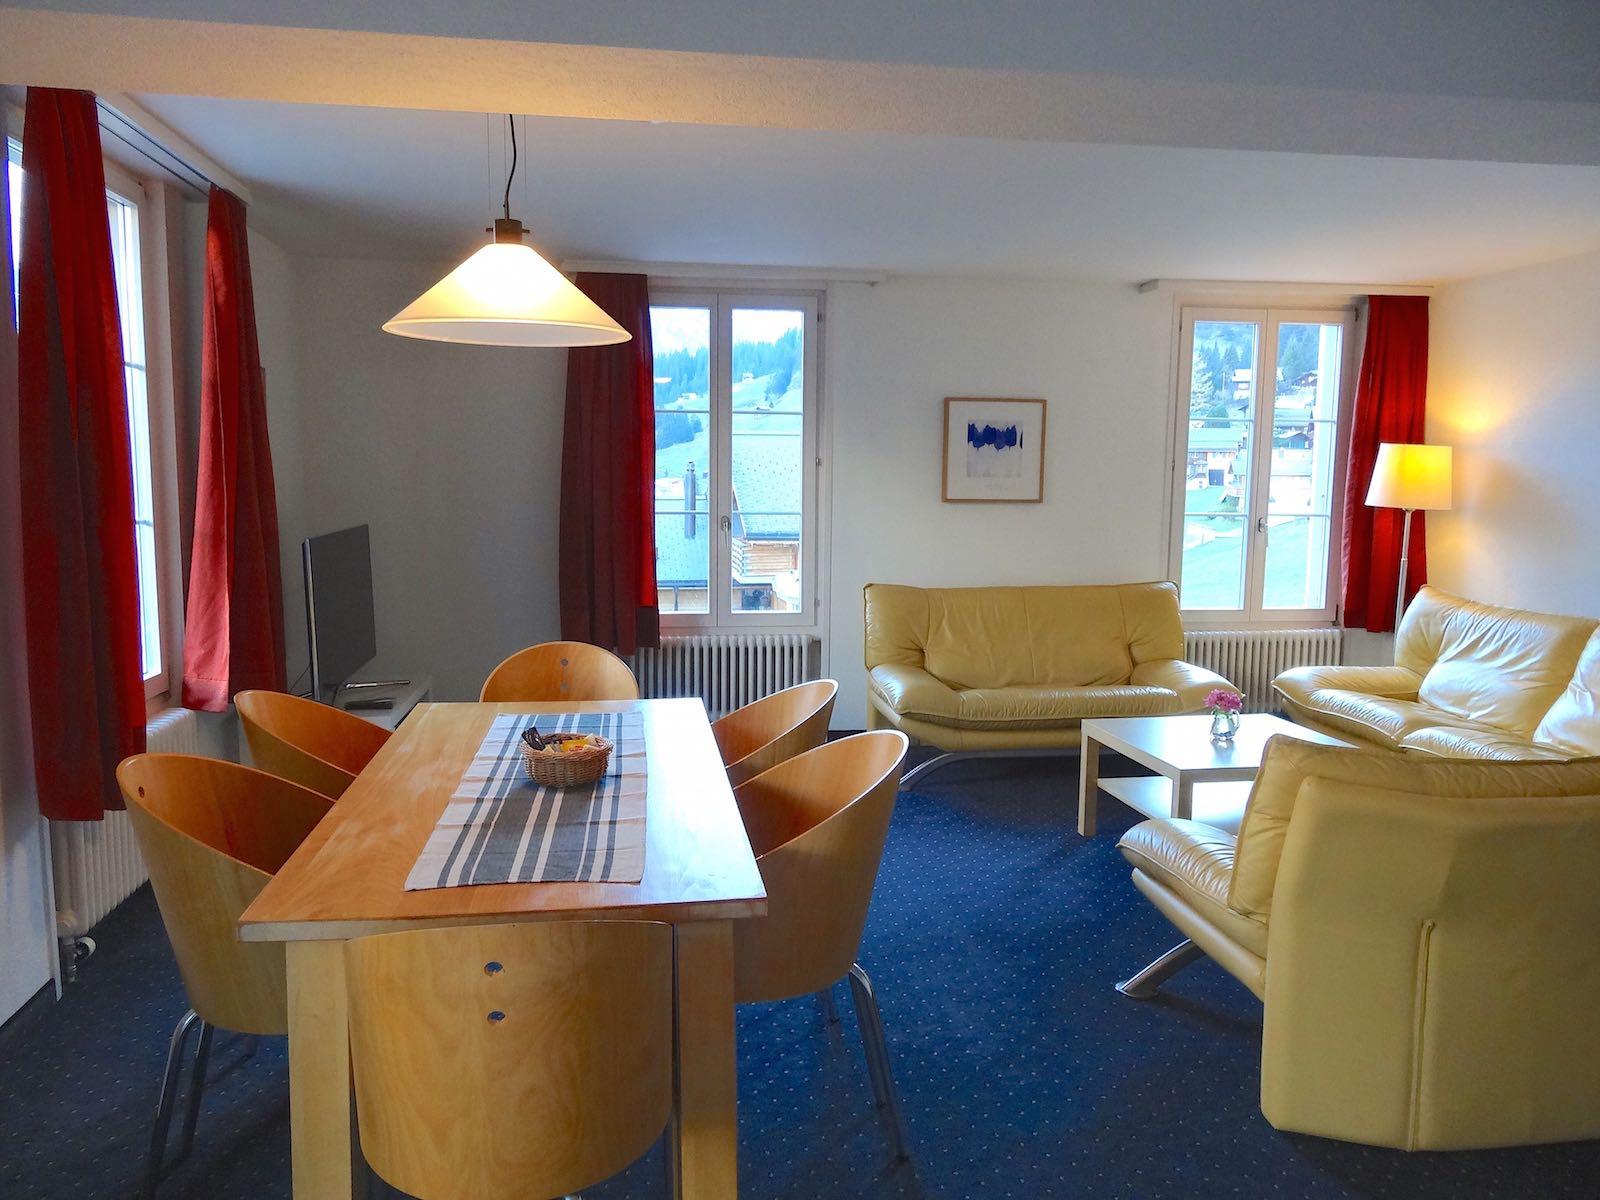 http://hoteljungfrau.ch/wp-content/uploads/2014/11/hotel-apartment-7.jpg